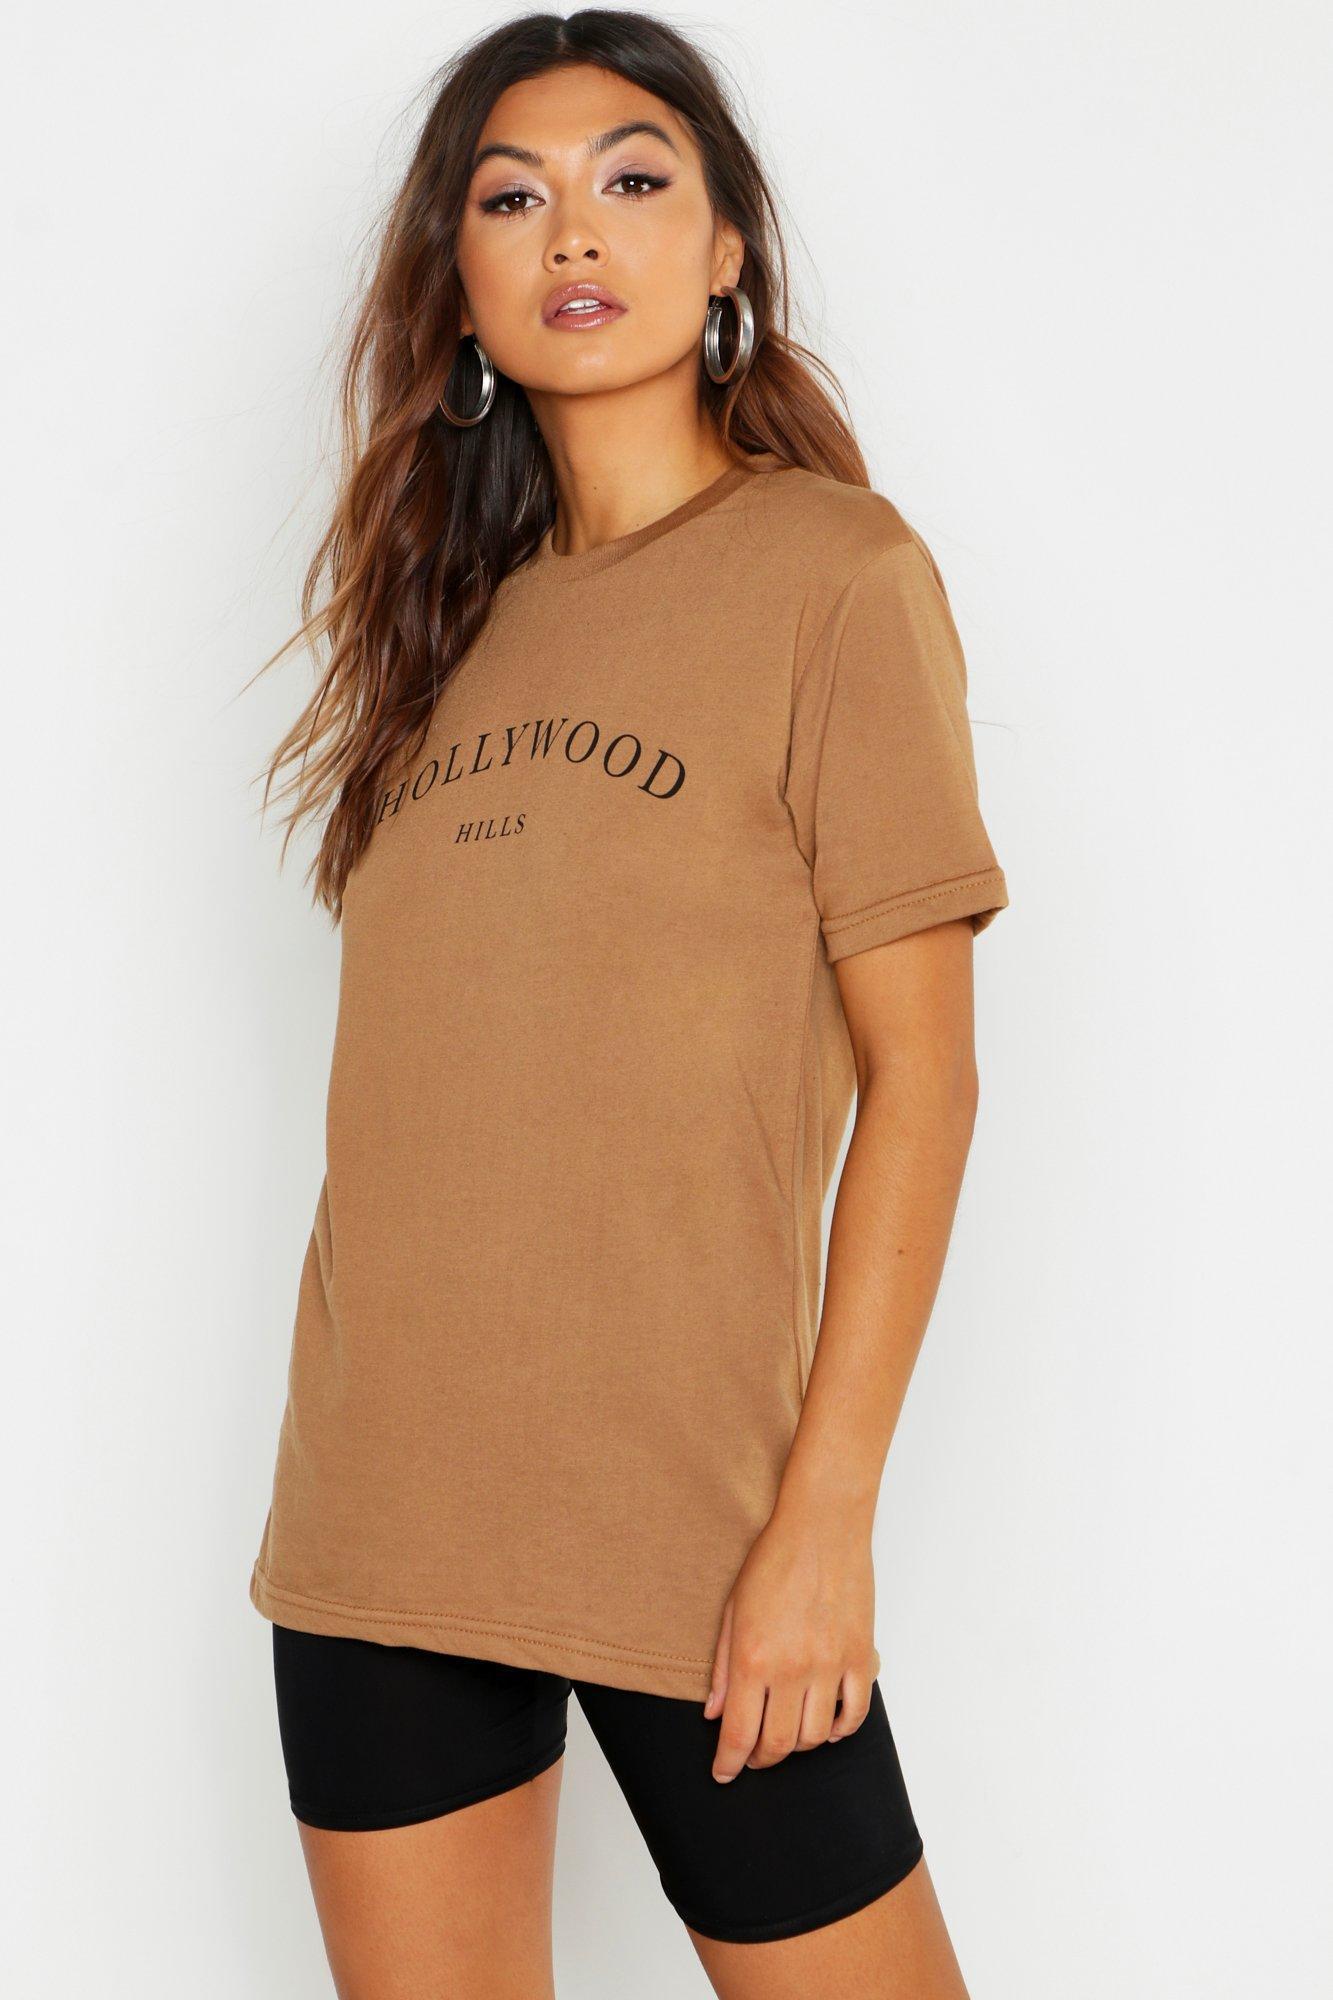 9e5514469f32f Boohoo. Women's Hollywood Slogan Printed T-shirt